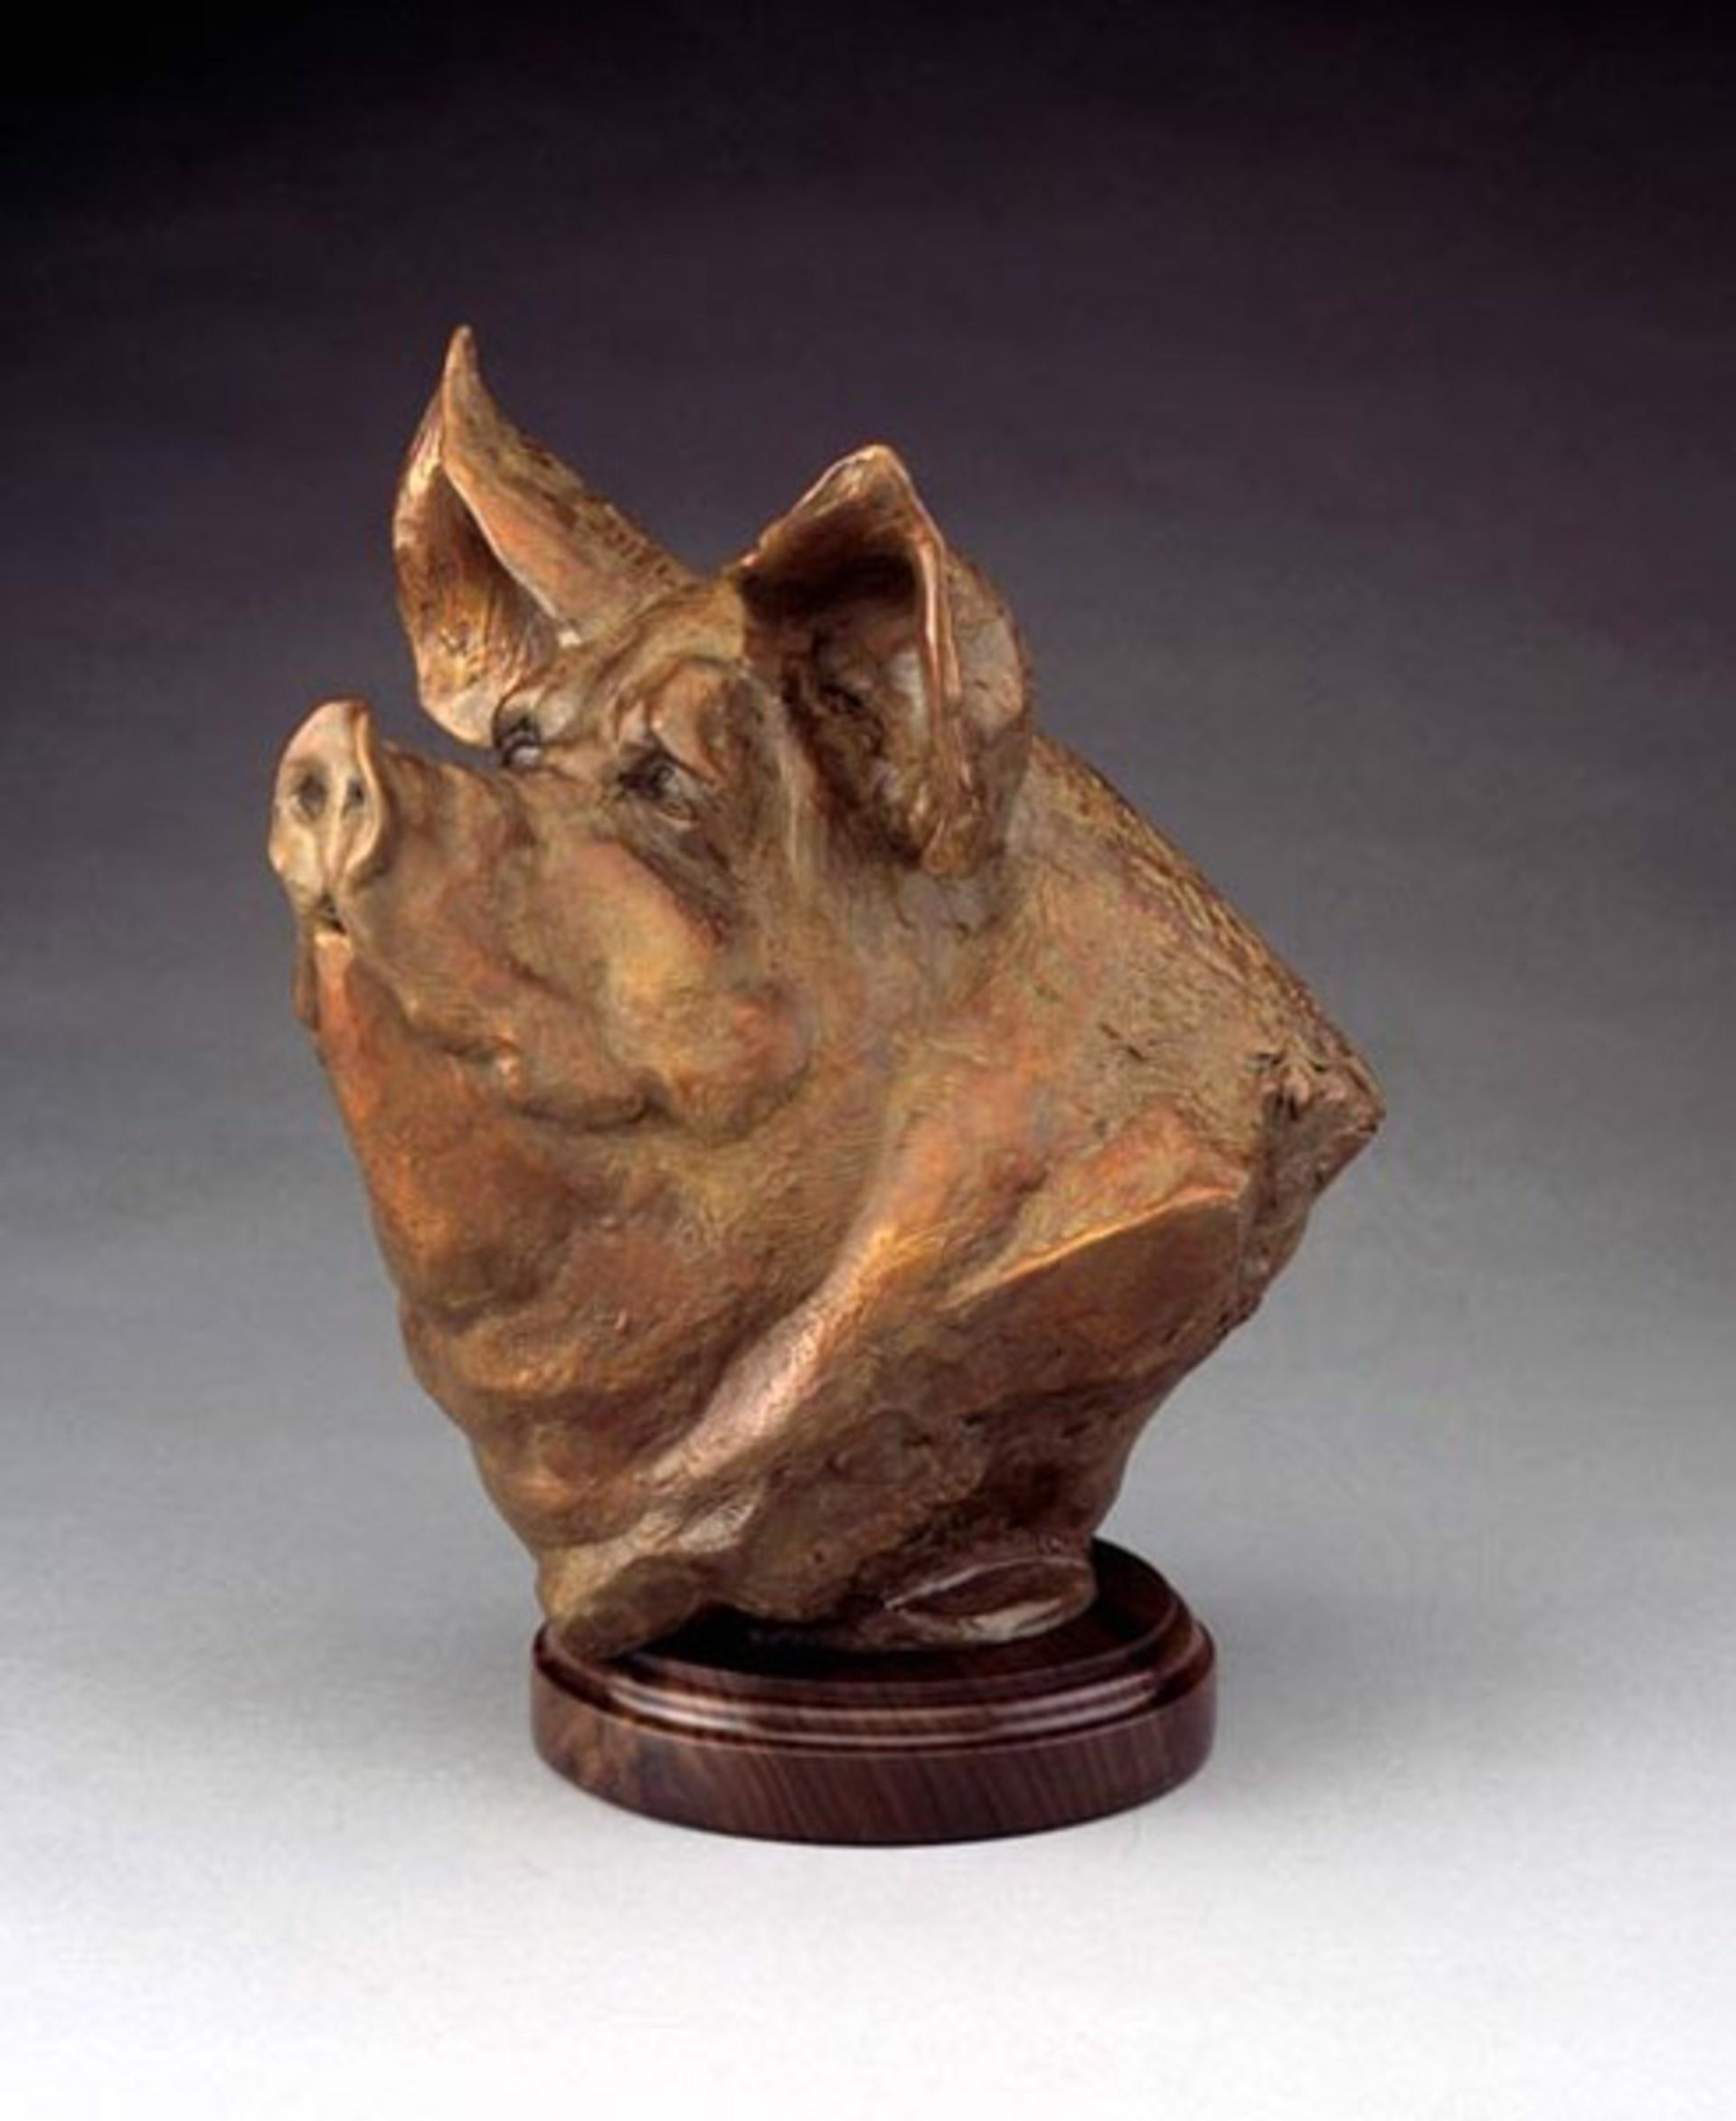 Pig Bust by Sandy Scott